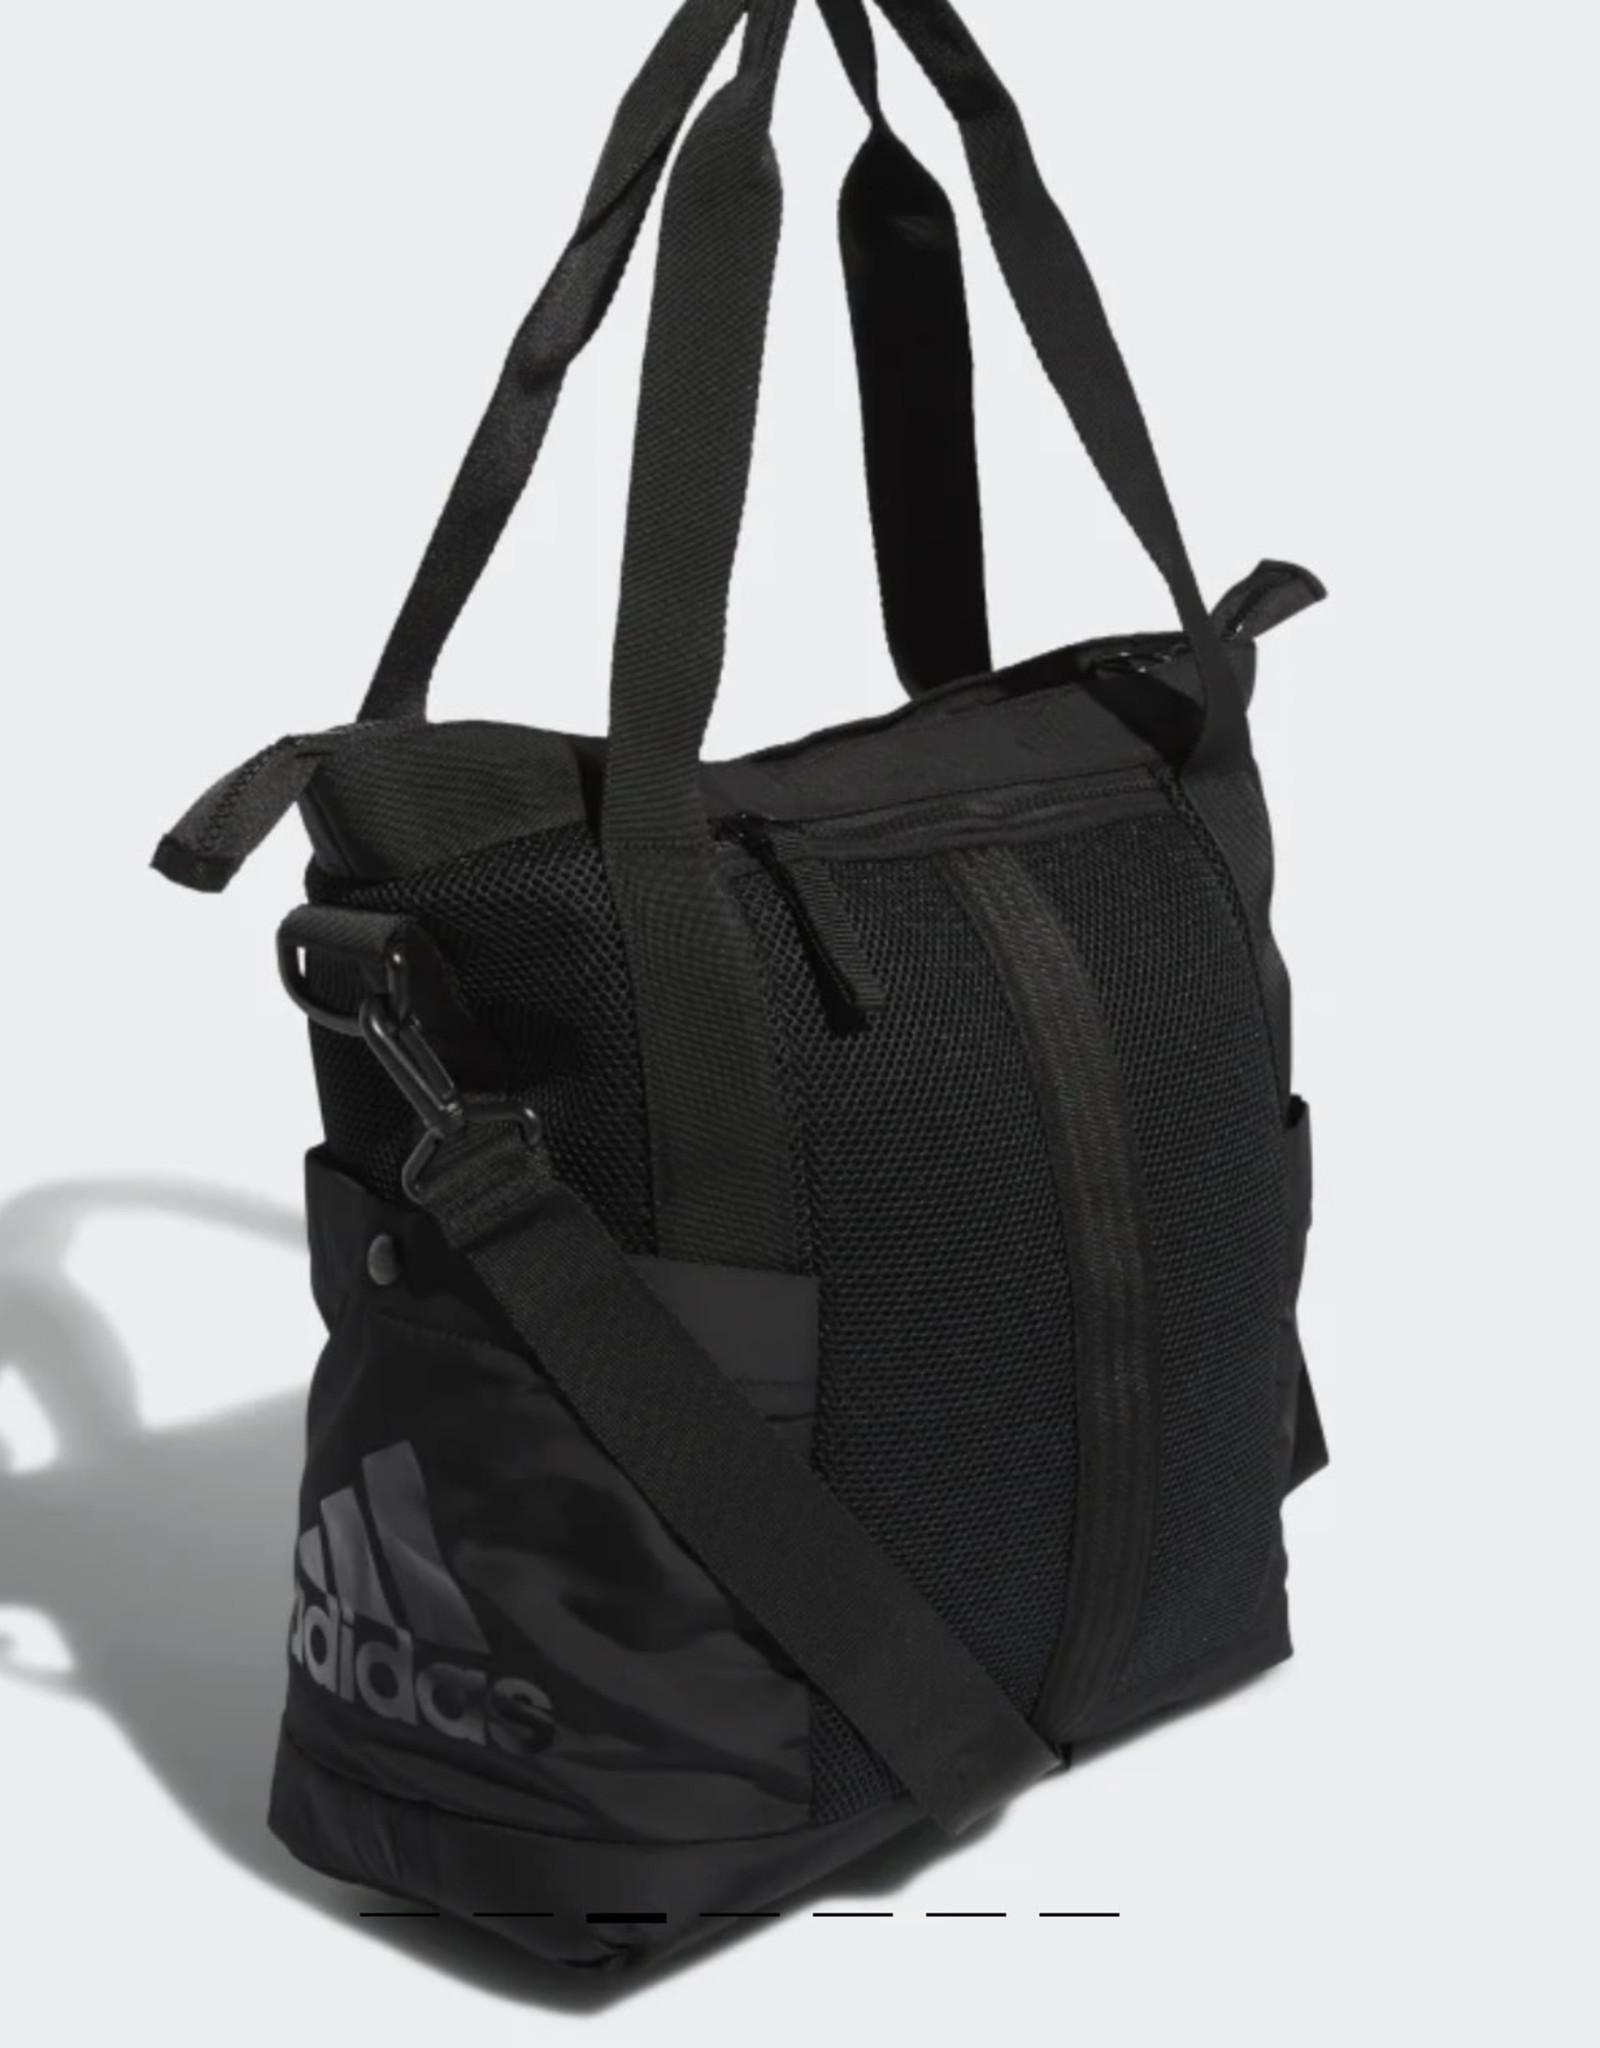 Adidas Adidas All Me Tote Bag w/ Adjustable Crossbody Strap